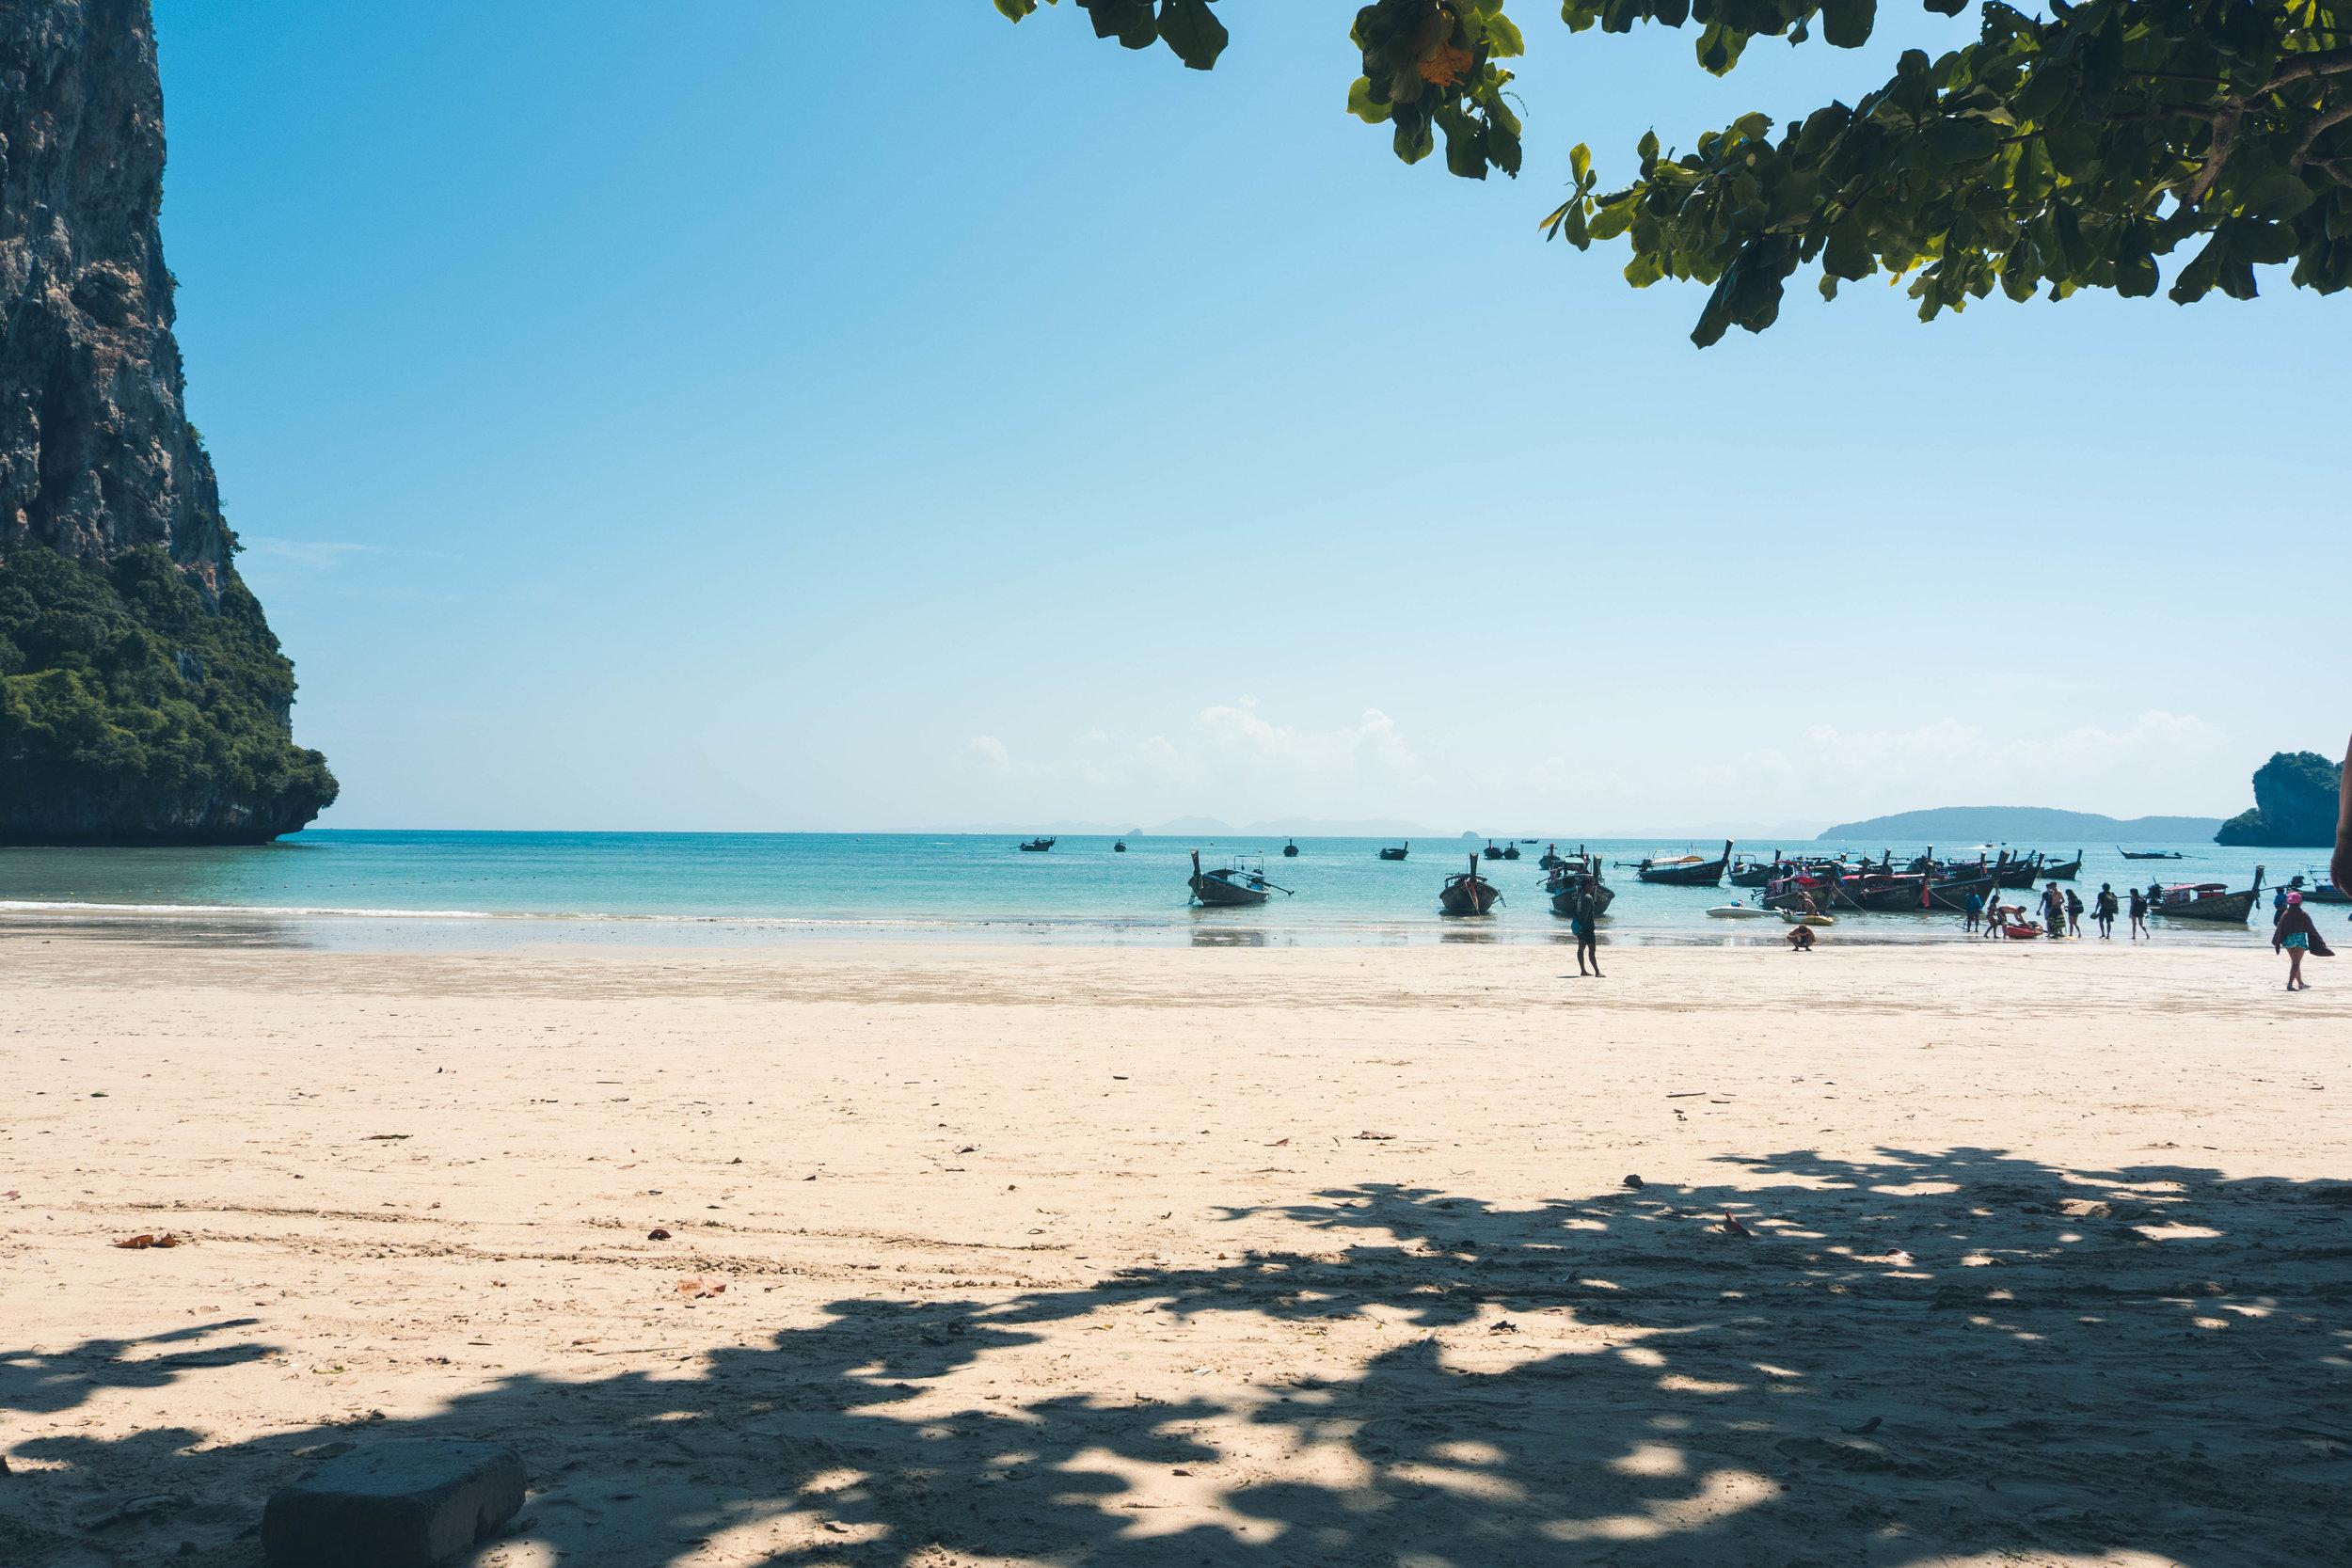 Best Beaches to Beat the Winter Blues - Krabi, Thailand